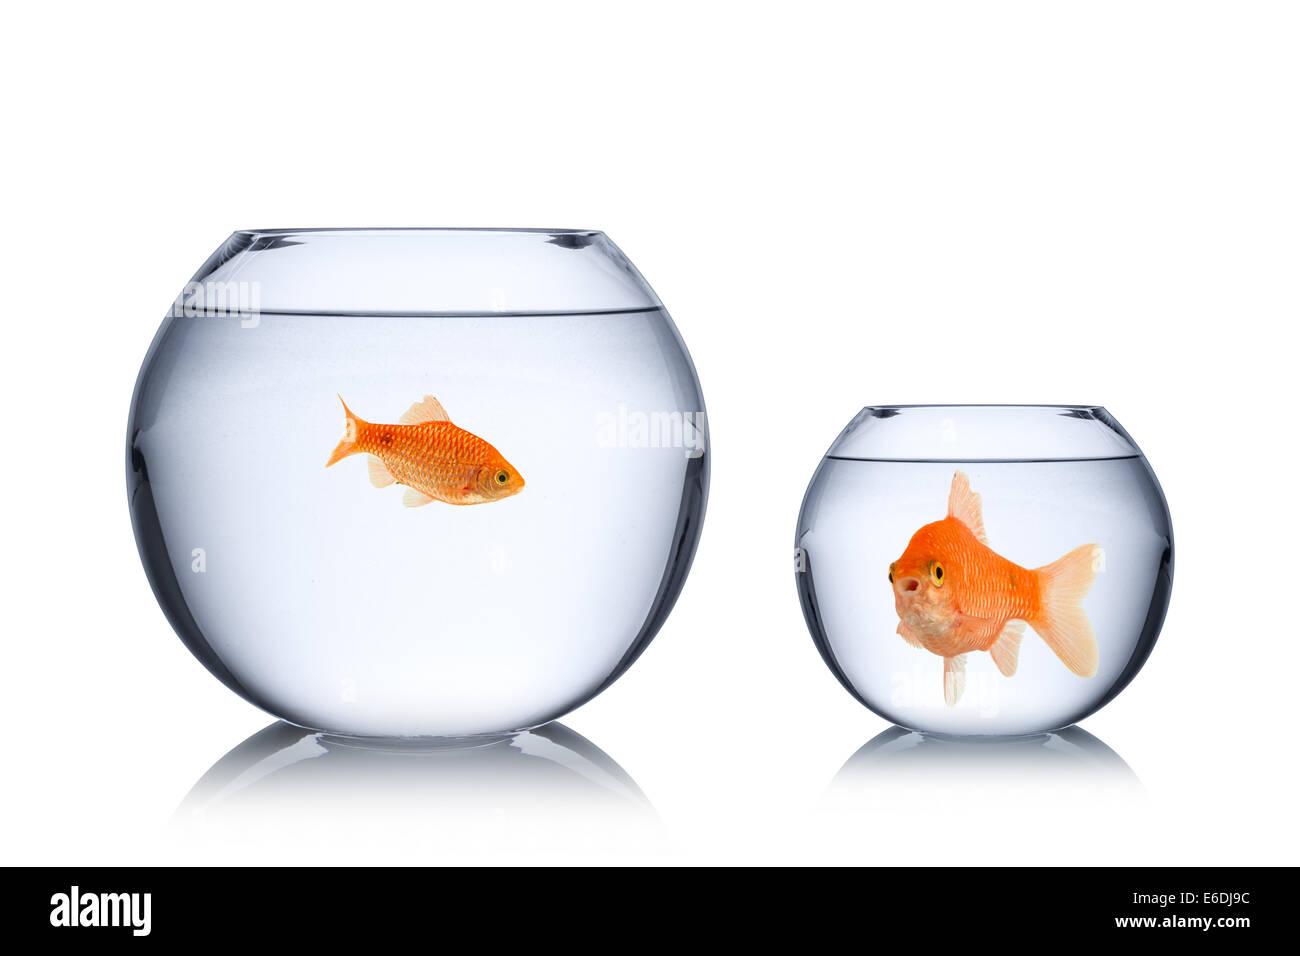 fish social envy concept - Stock Image